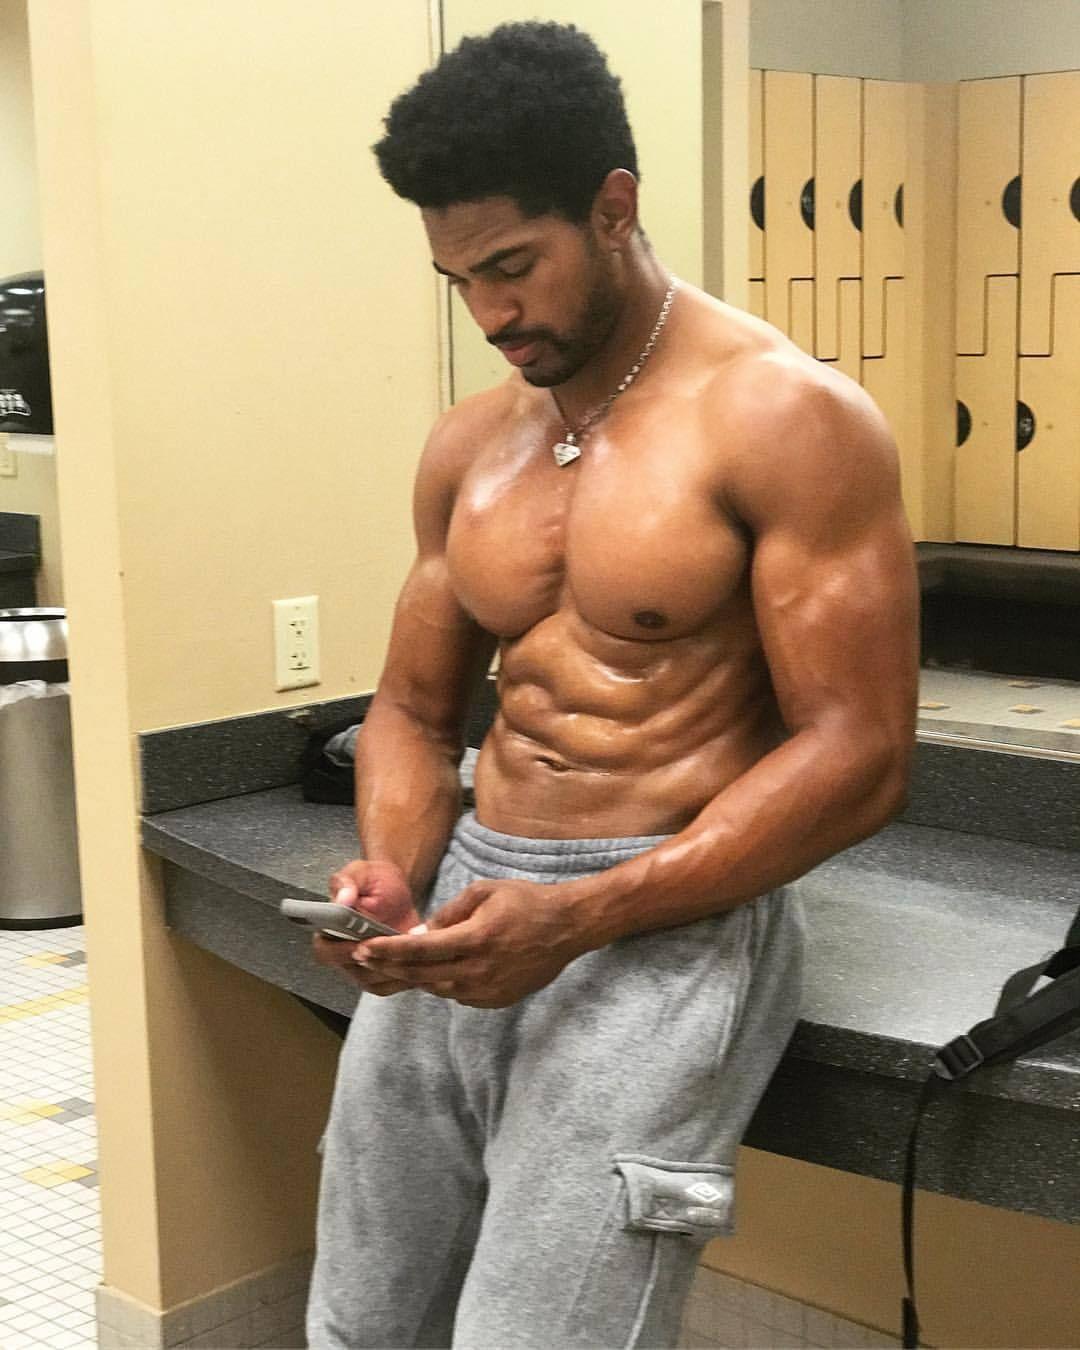 Pin By Alpha Lookbook On Traits Of An Ebony Alpha Male Fun Workouts La Fitness Oppressed People